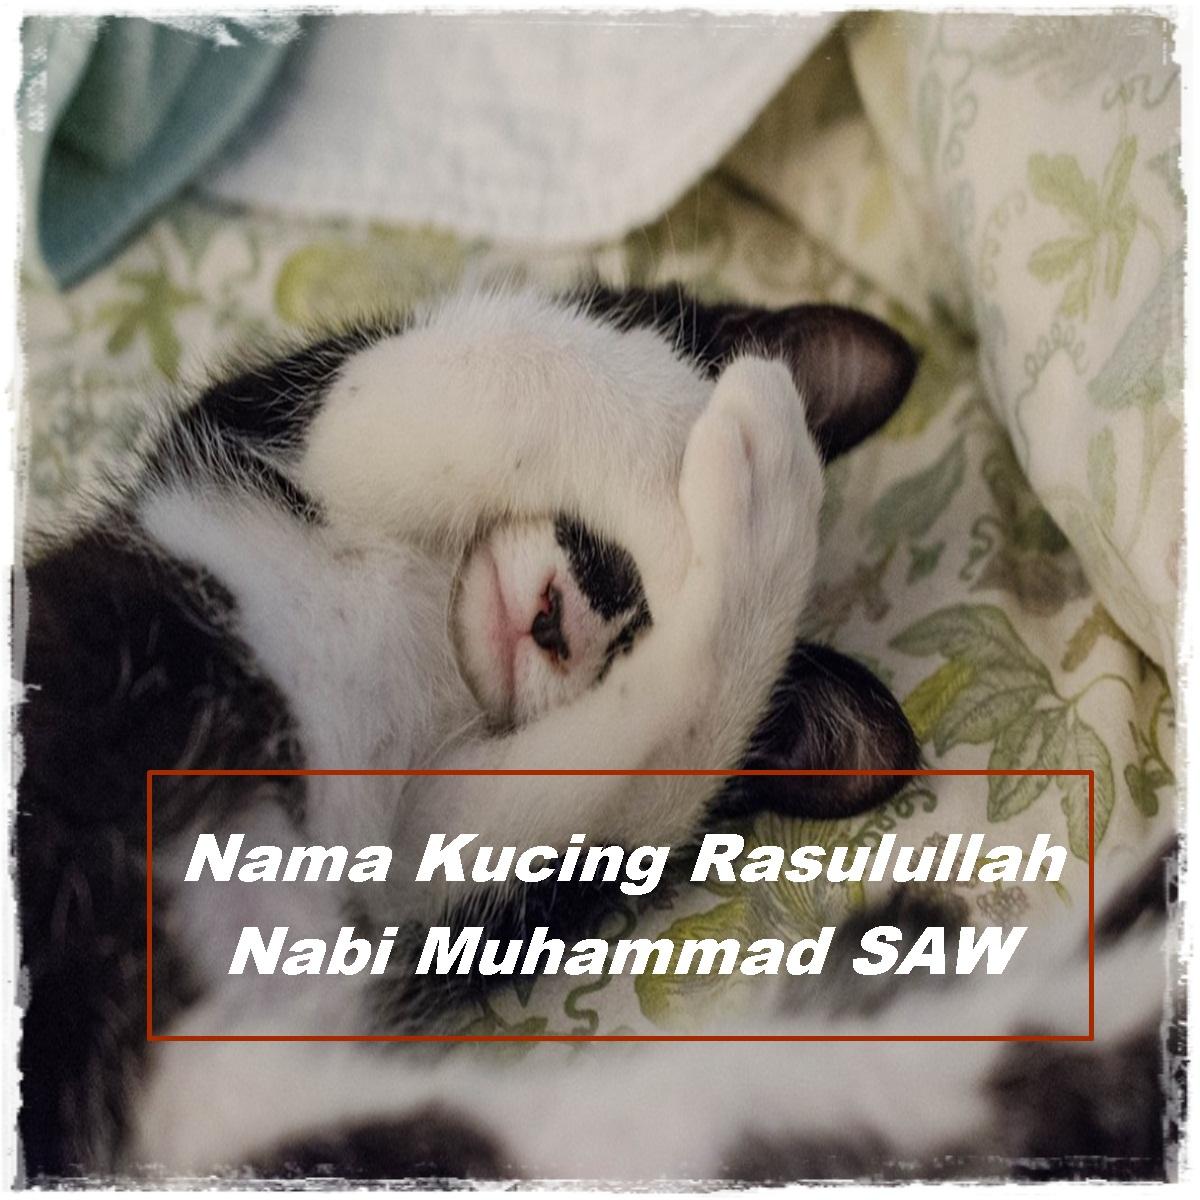 Nama Kucing Rasulullah Nabi Muhammad SAW